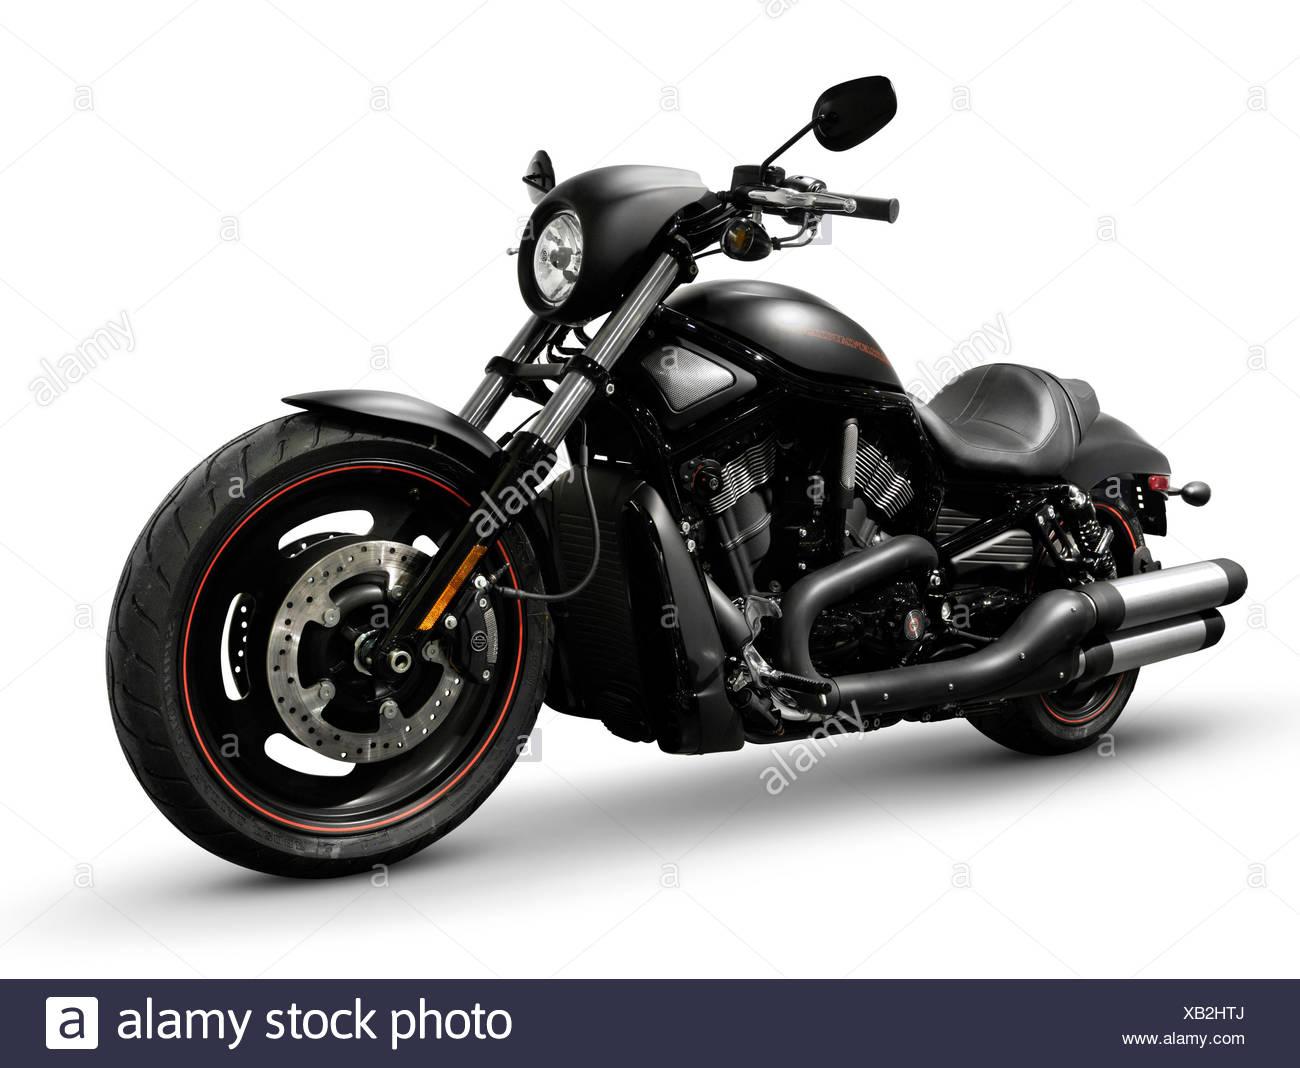 Black 2007 Harley Davidson Vrscd Night Rod Special Motorcycle Isolated On White Background Stock Photo Alamy